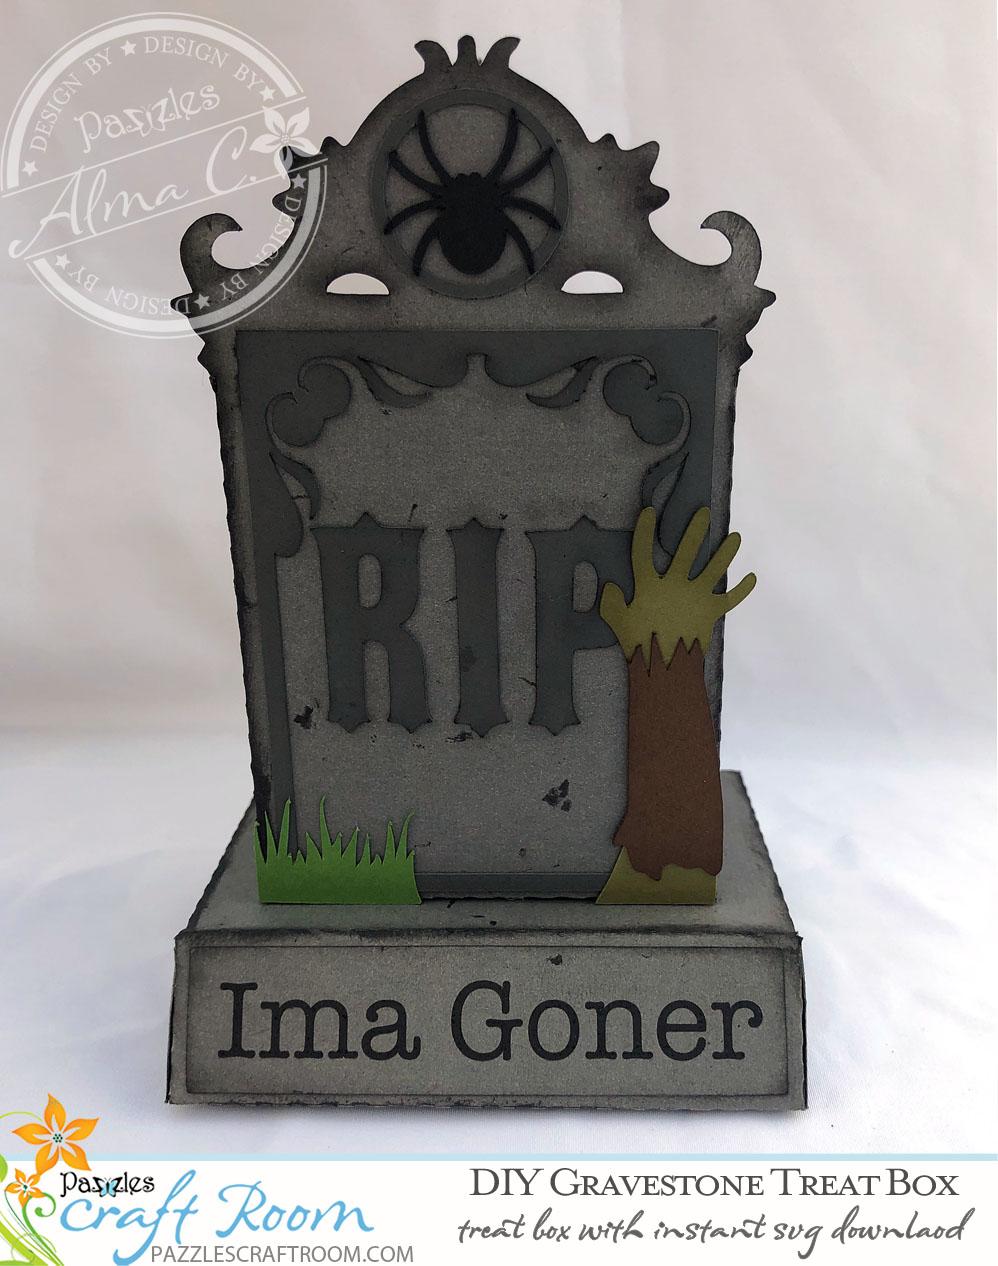 Pazzles Halloween DIY Gravestone Treat Box by Alma Cervantes